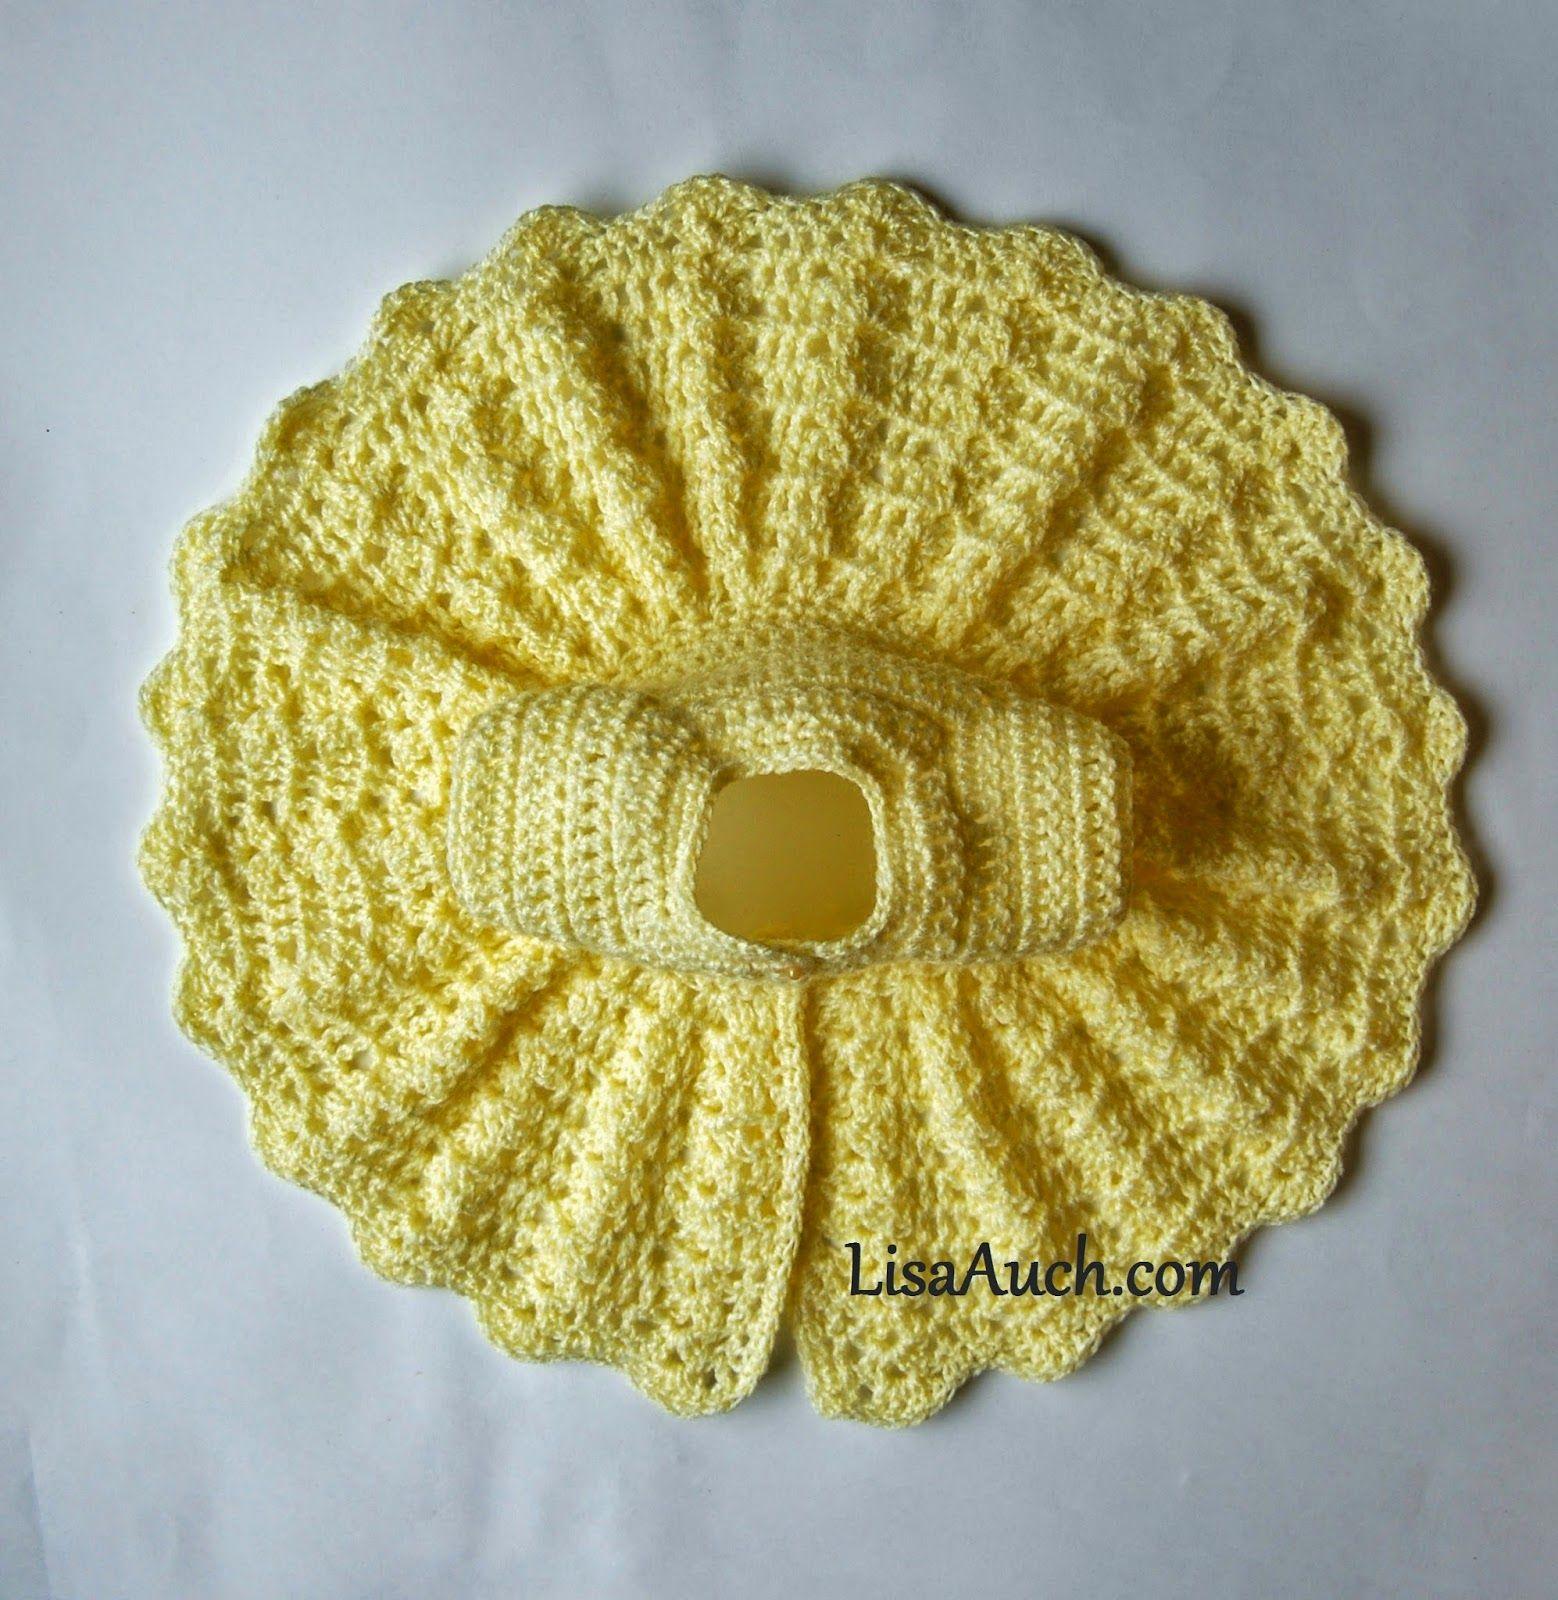 Free crochet pattern for a vintage modern style baby cardigan free crochet pattern for a vintage modern style baby cardigan bankloansurffo Gallery